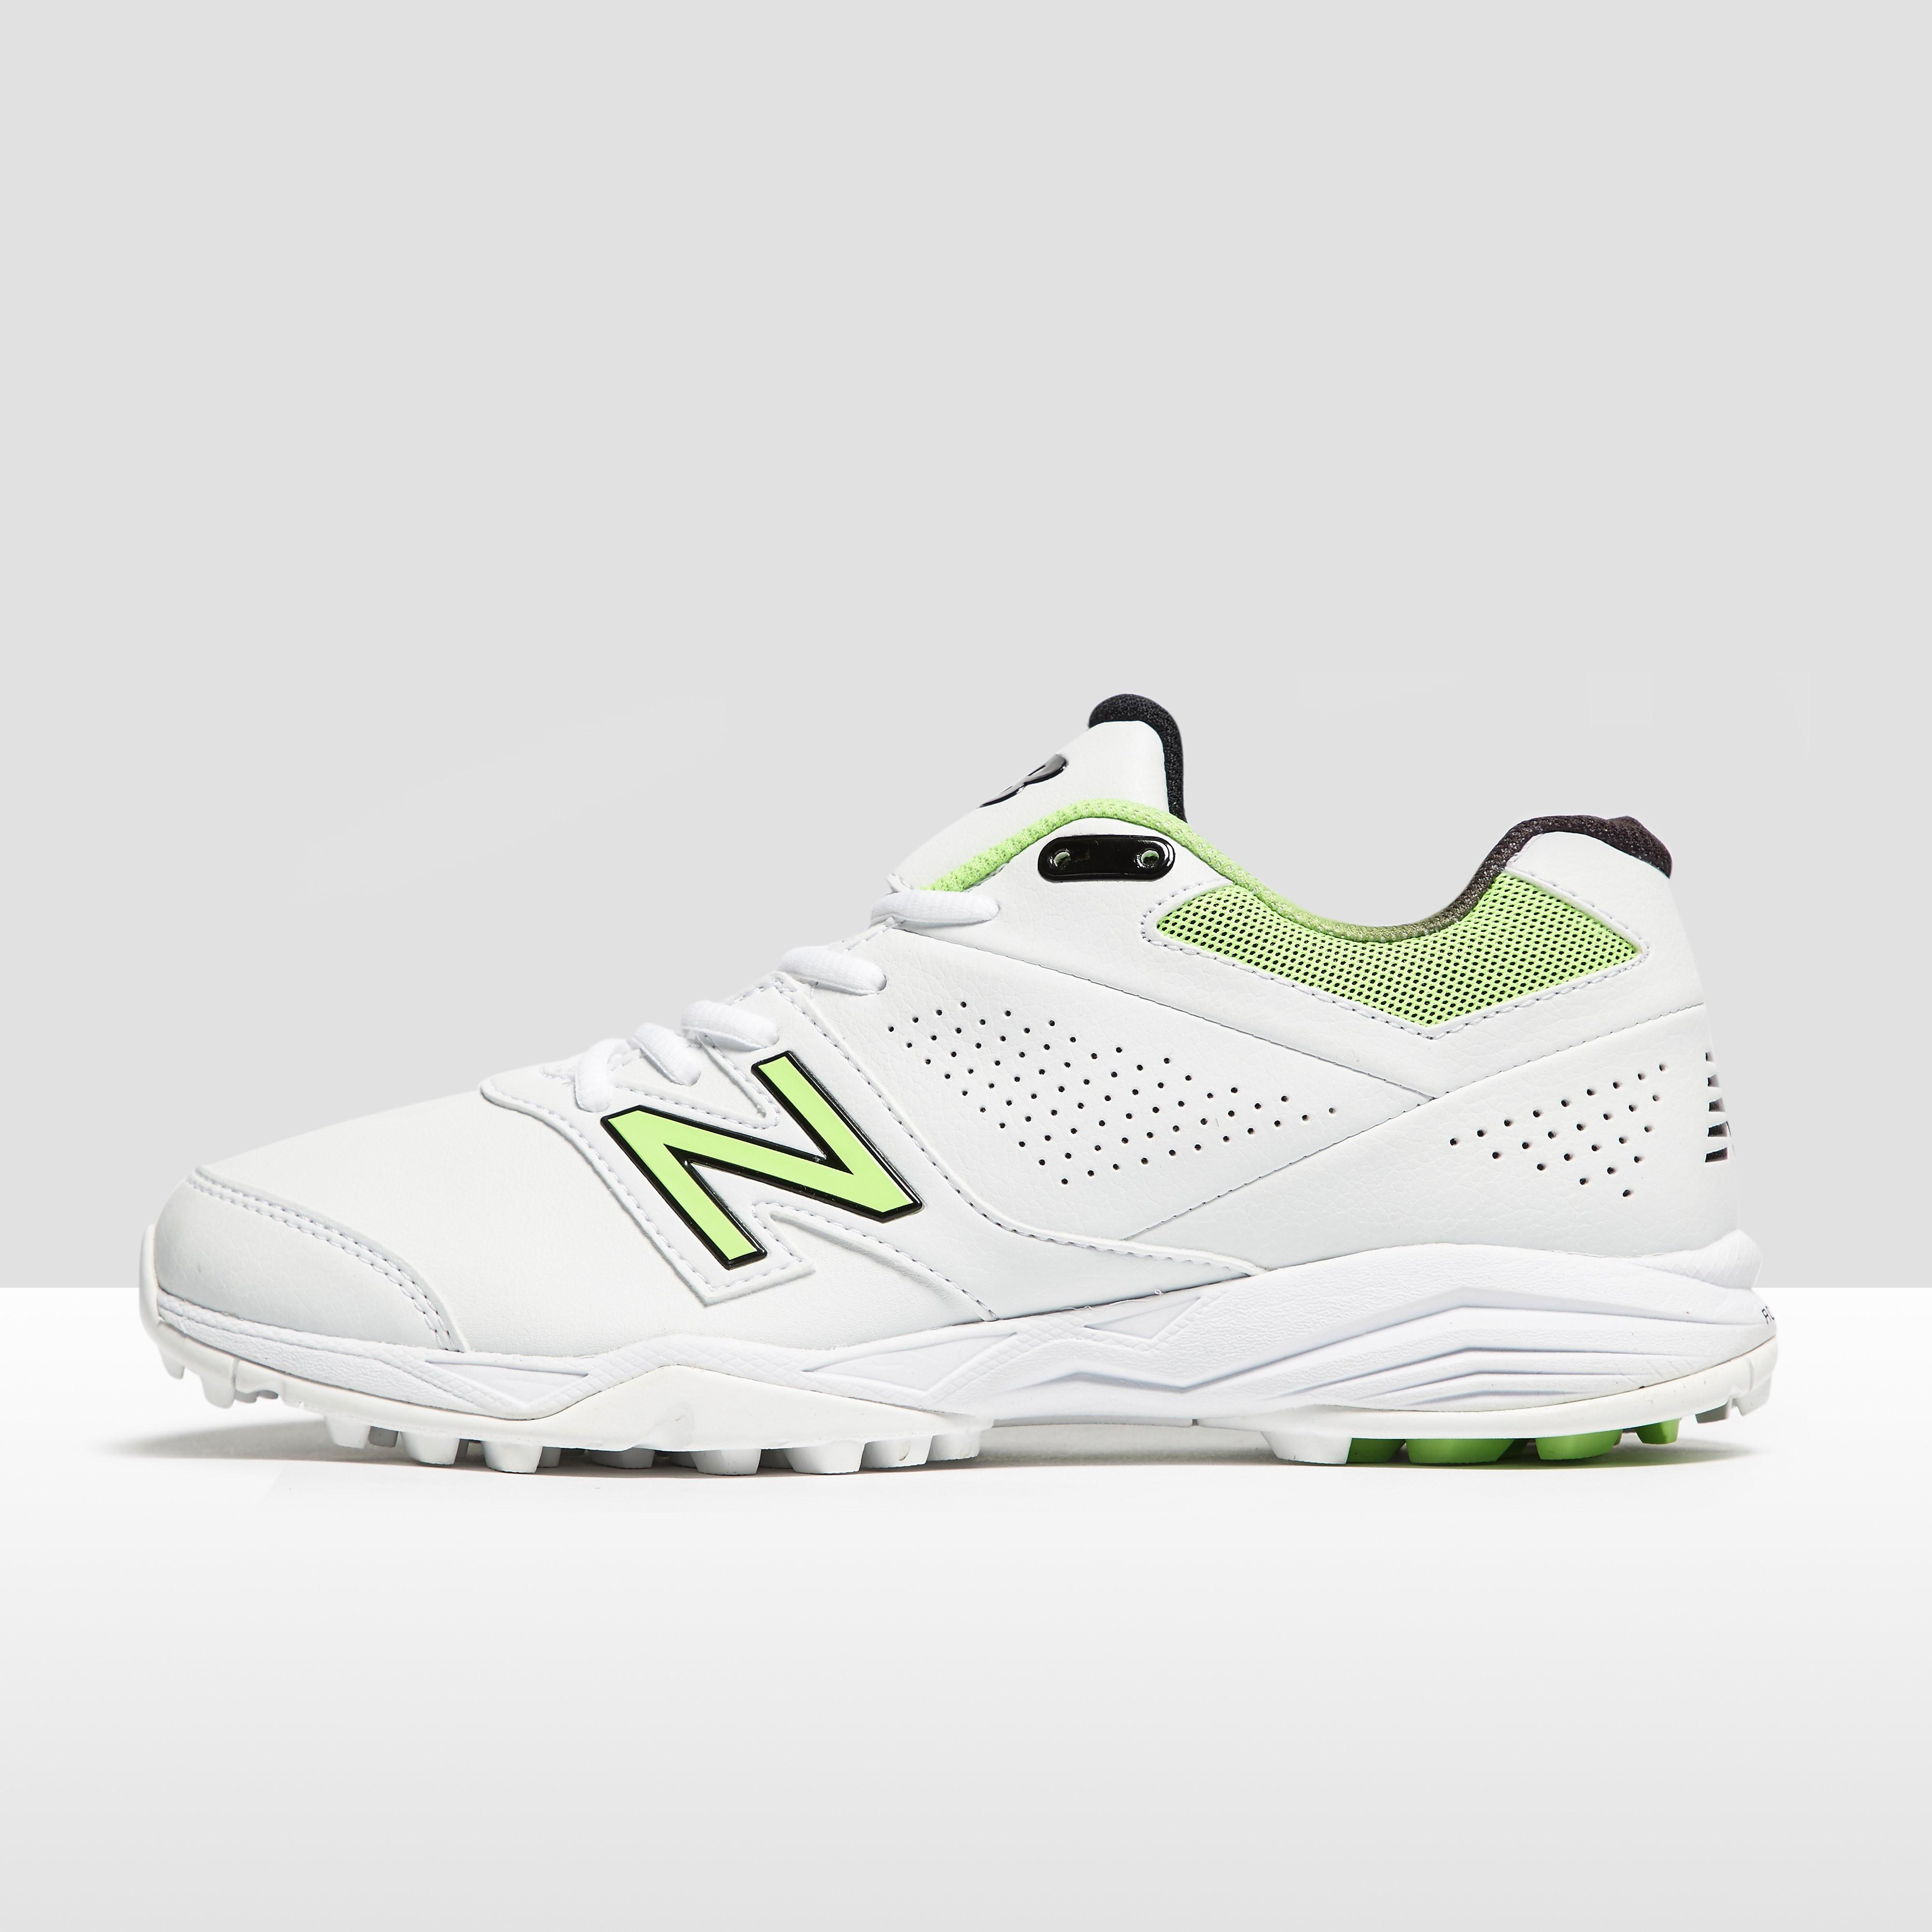 Men's New Balance CK4020 Cricket Shoes - White, White